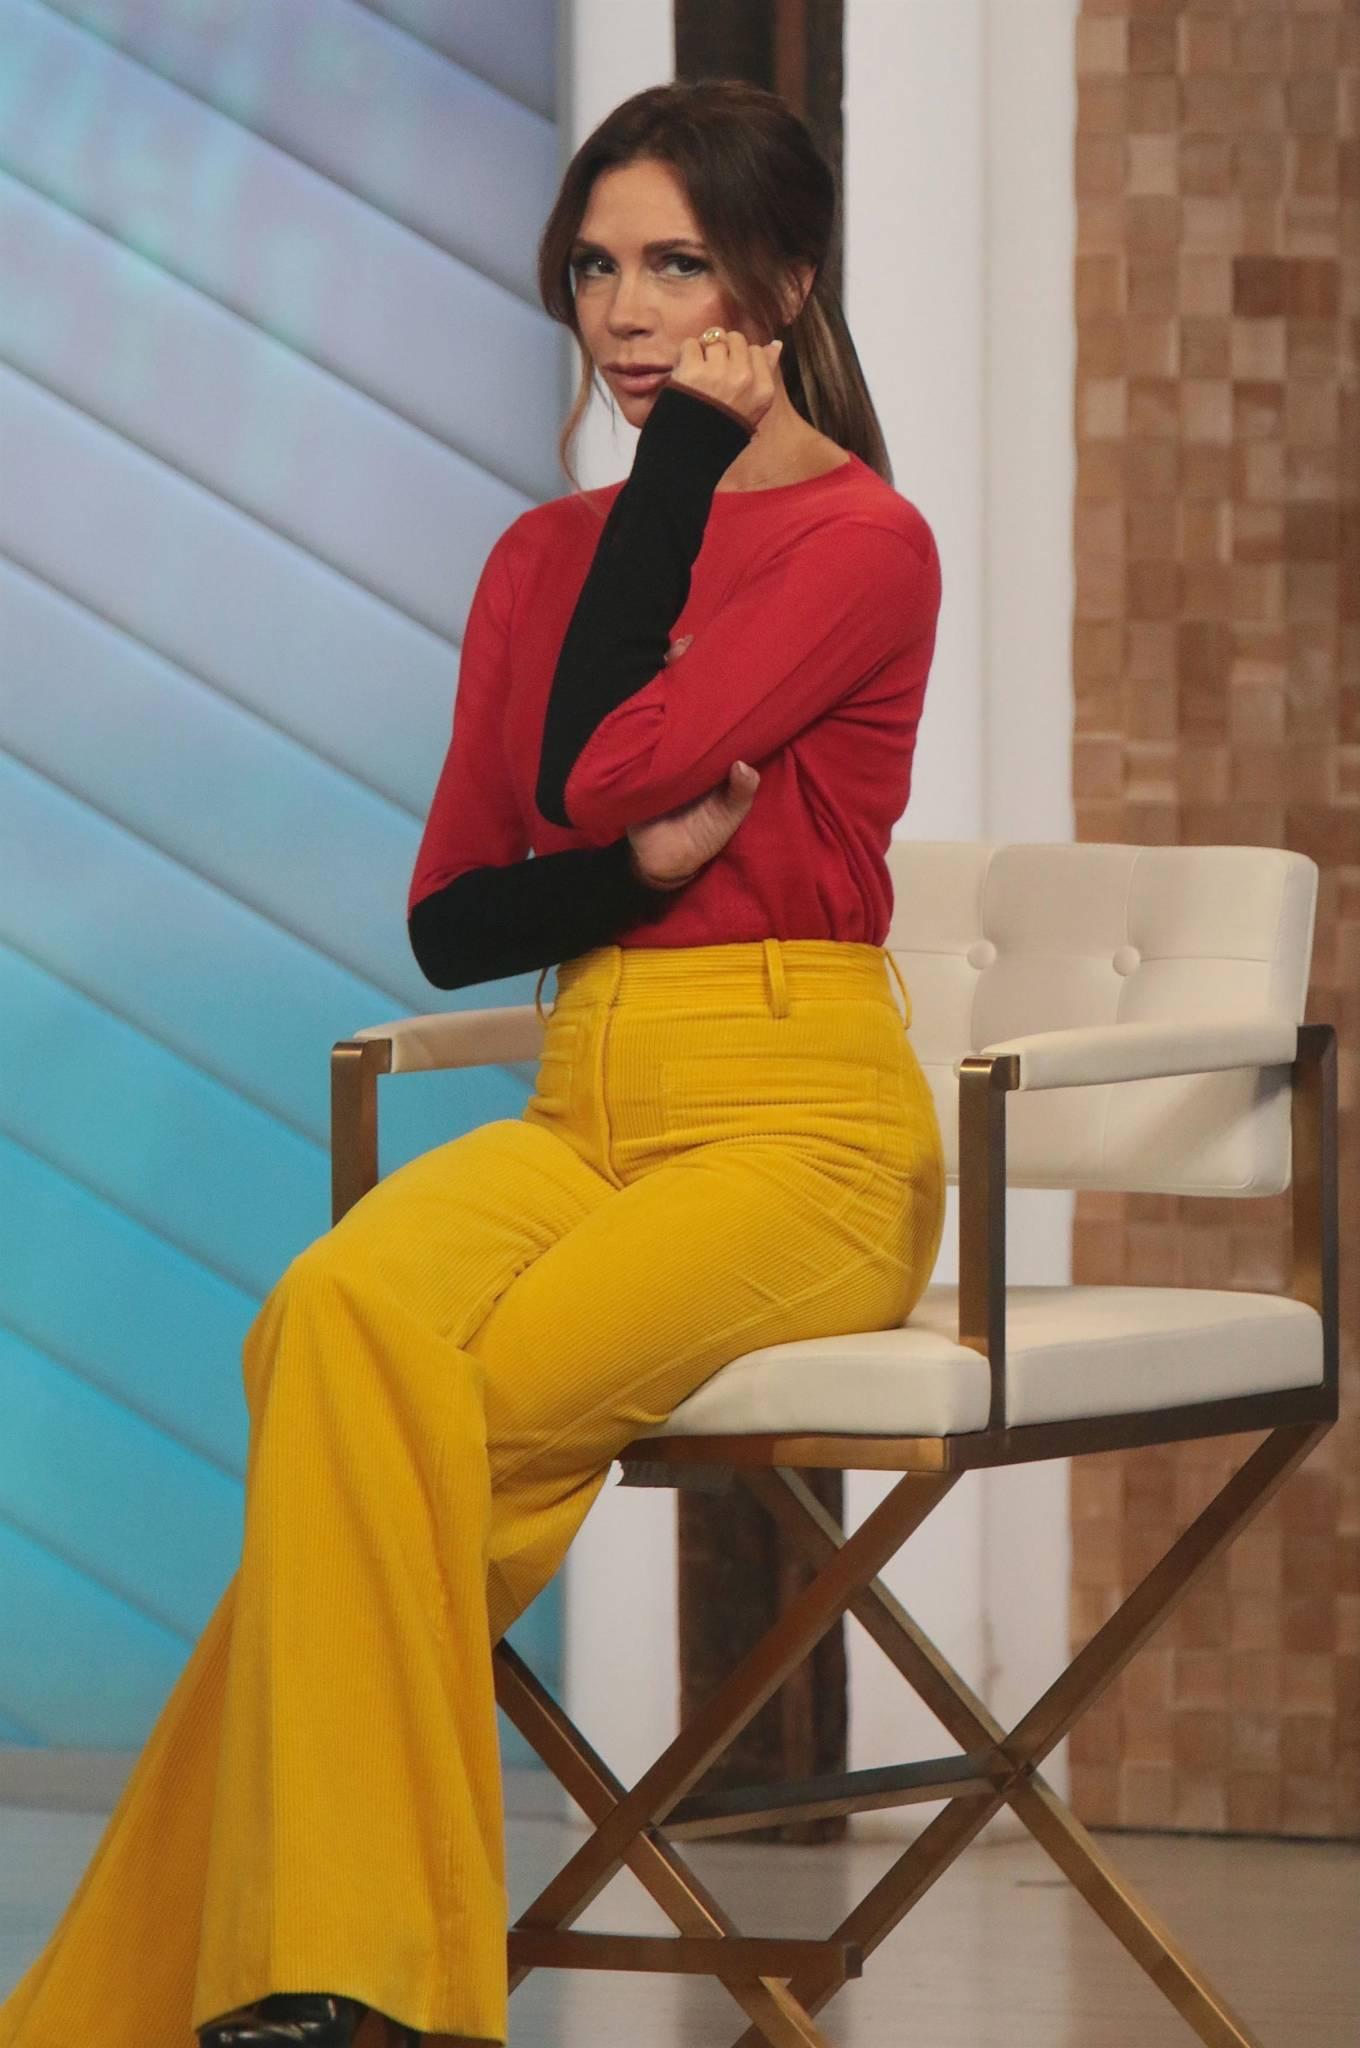 Victoria Beckham 2021 : Victoria Beckham – on Good Morning America promoting her new designer clothing in New York City-17